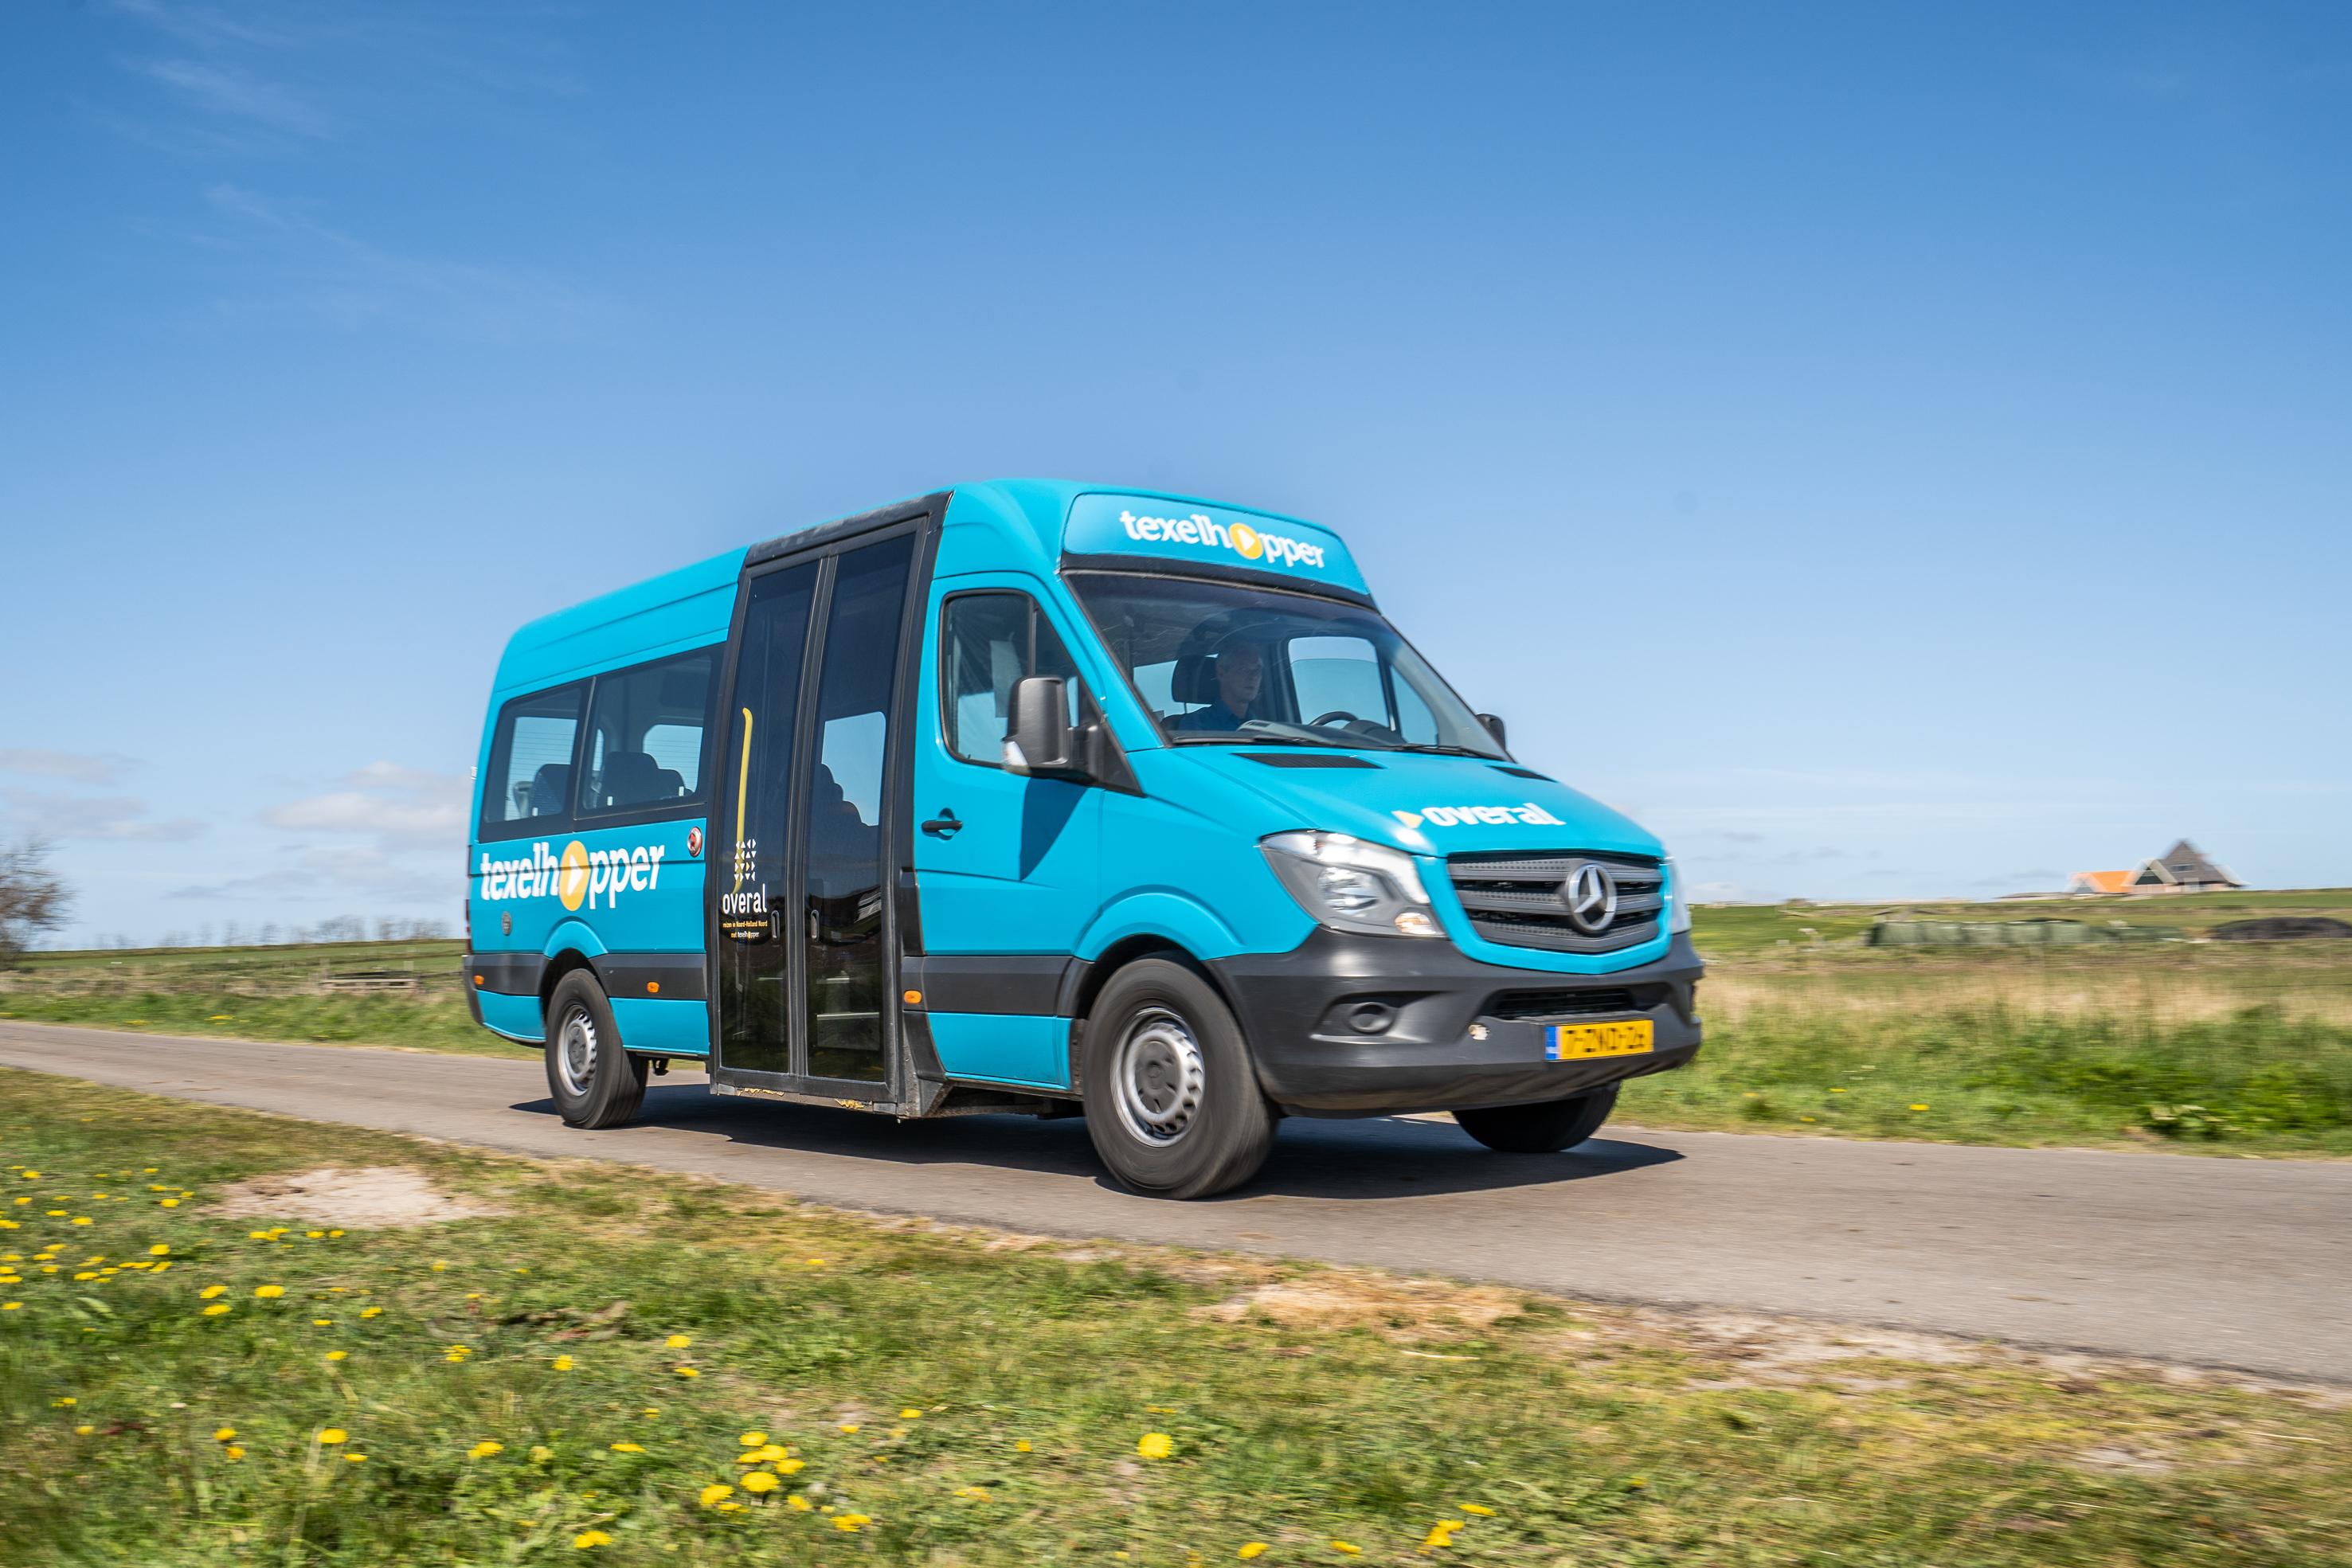 Texelhopper busje VVV Texel